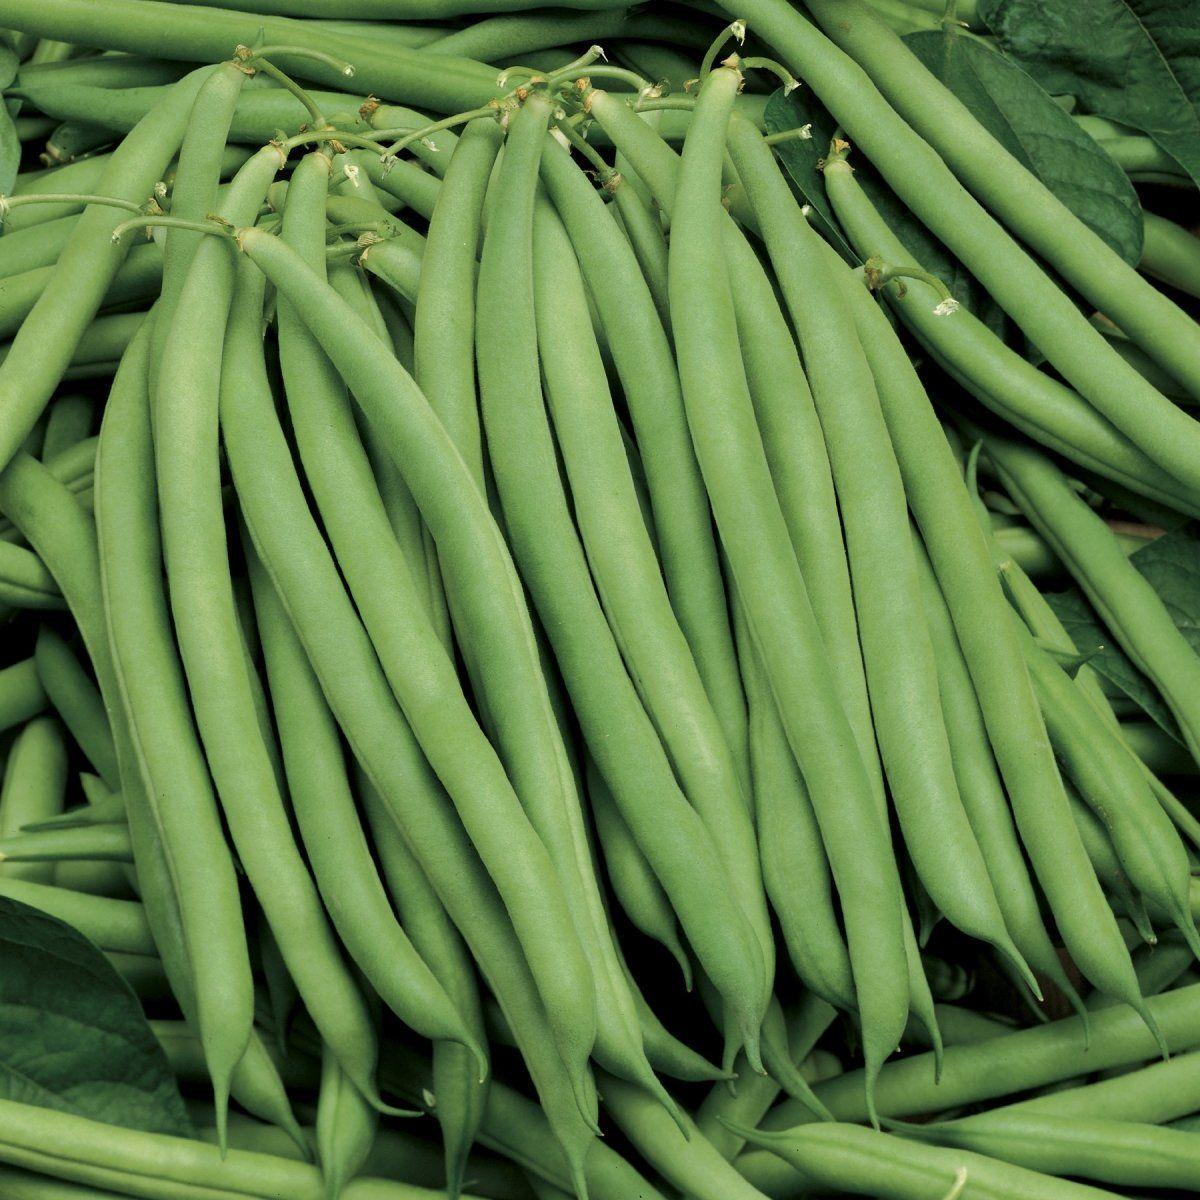 Семена фасоли Серенгети, 100 шт — ранняя (55 дней), спаржевая Syngenta